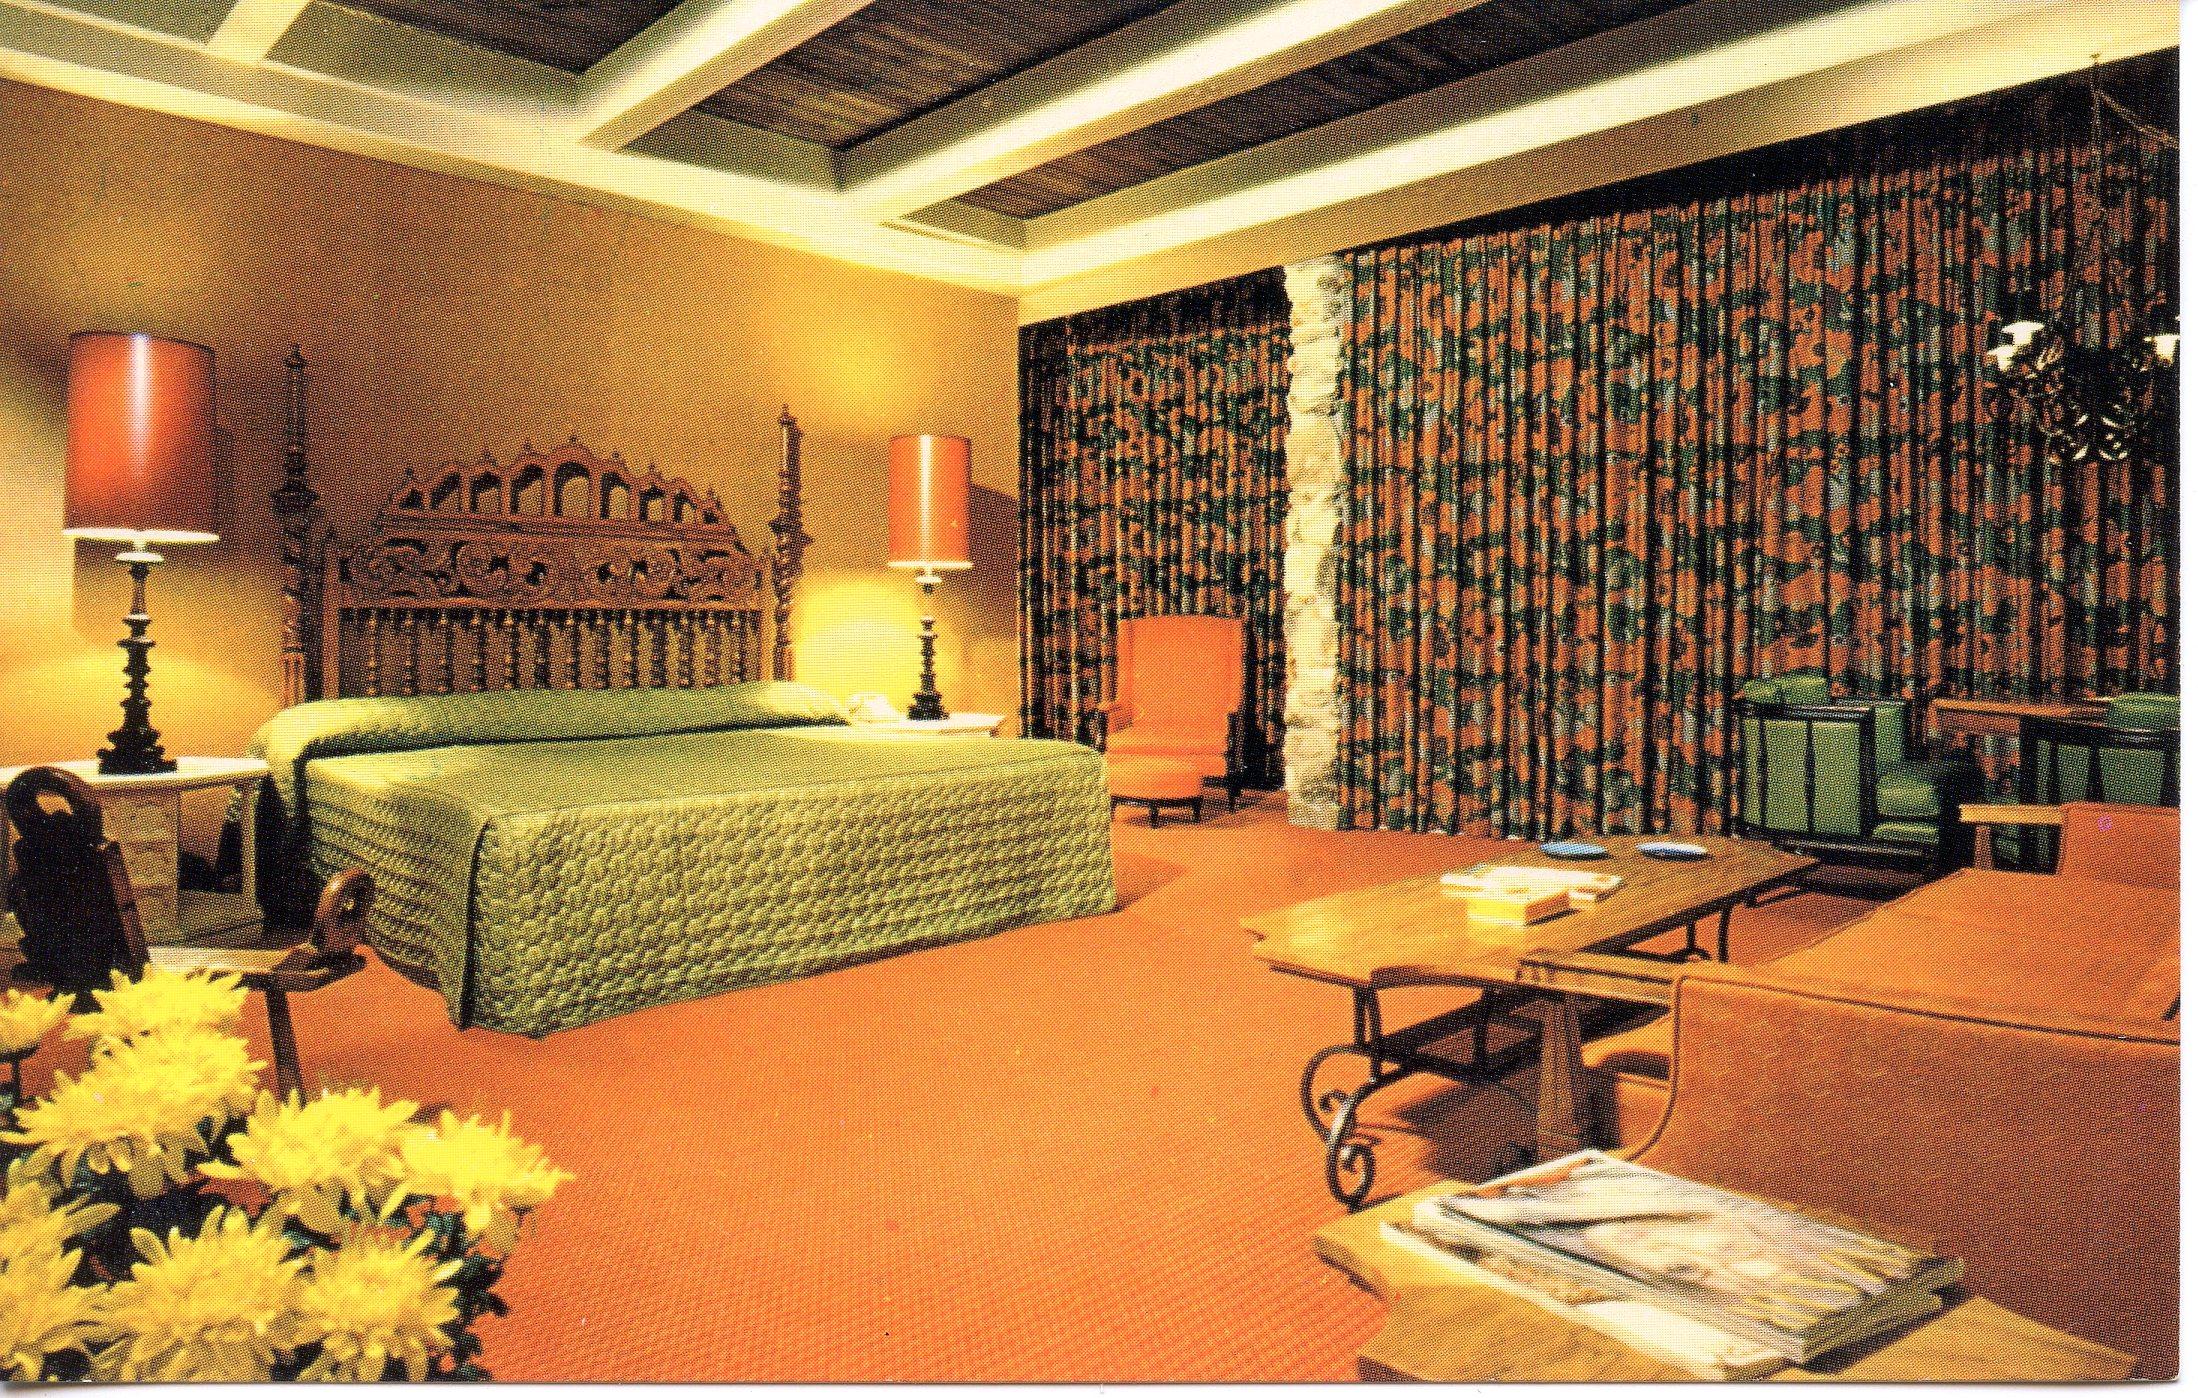 Us Pc907 Lodge Of The Four Seasons Lake Ozark Mo Hippostcard